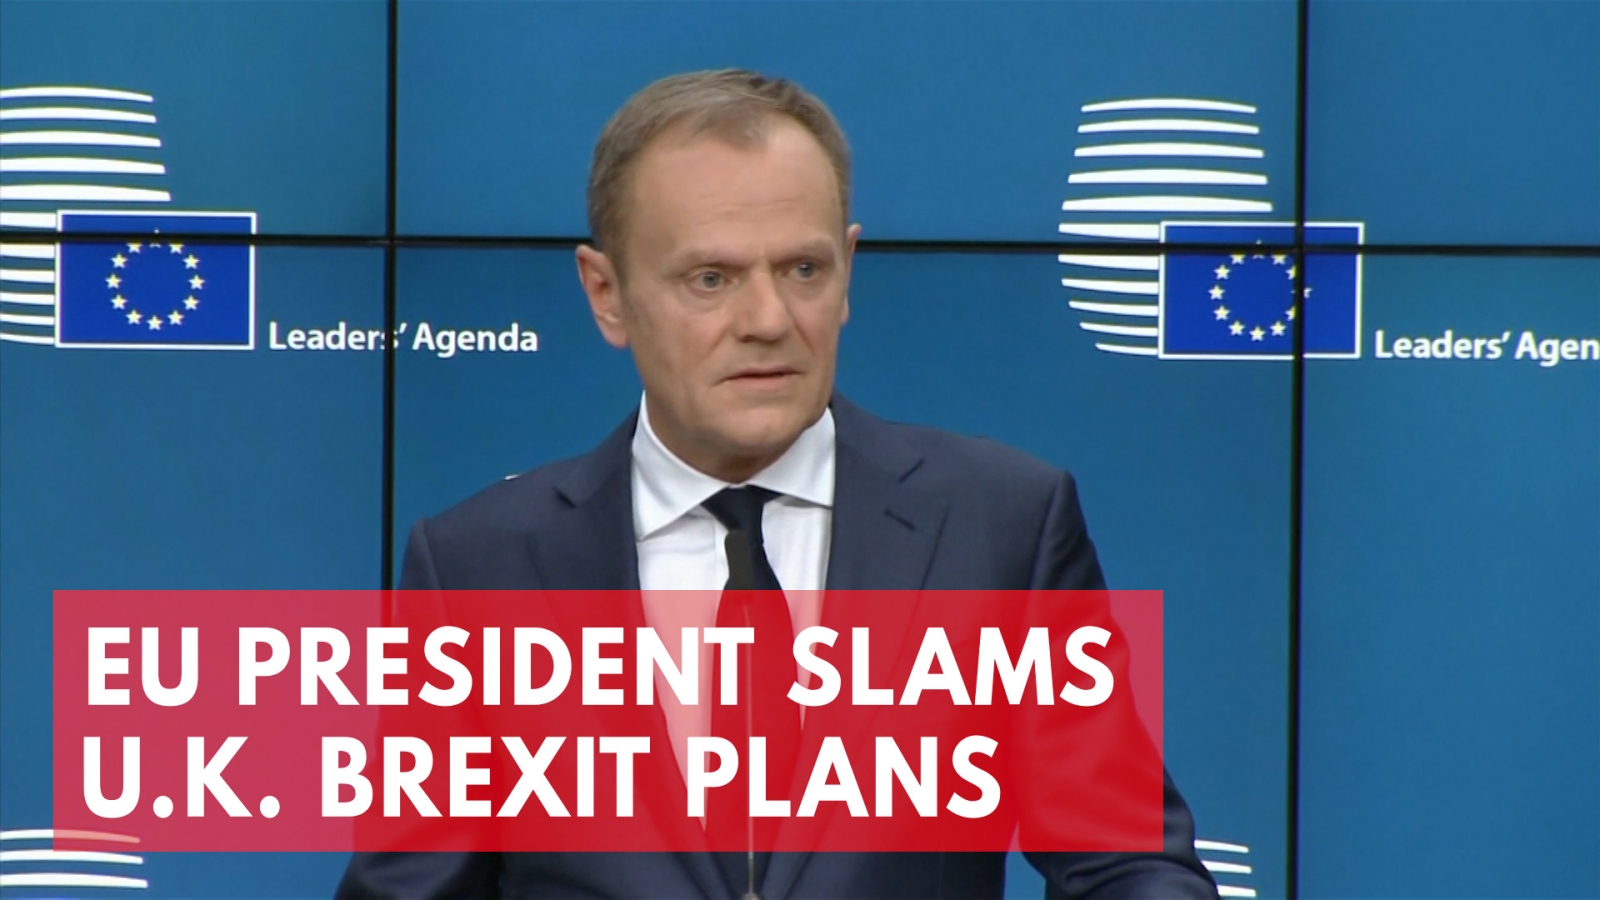 eu-president-donald-tusk-slams-uks-brexit-plans-as-pure-illusion